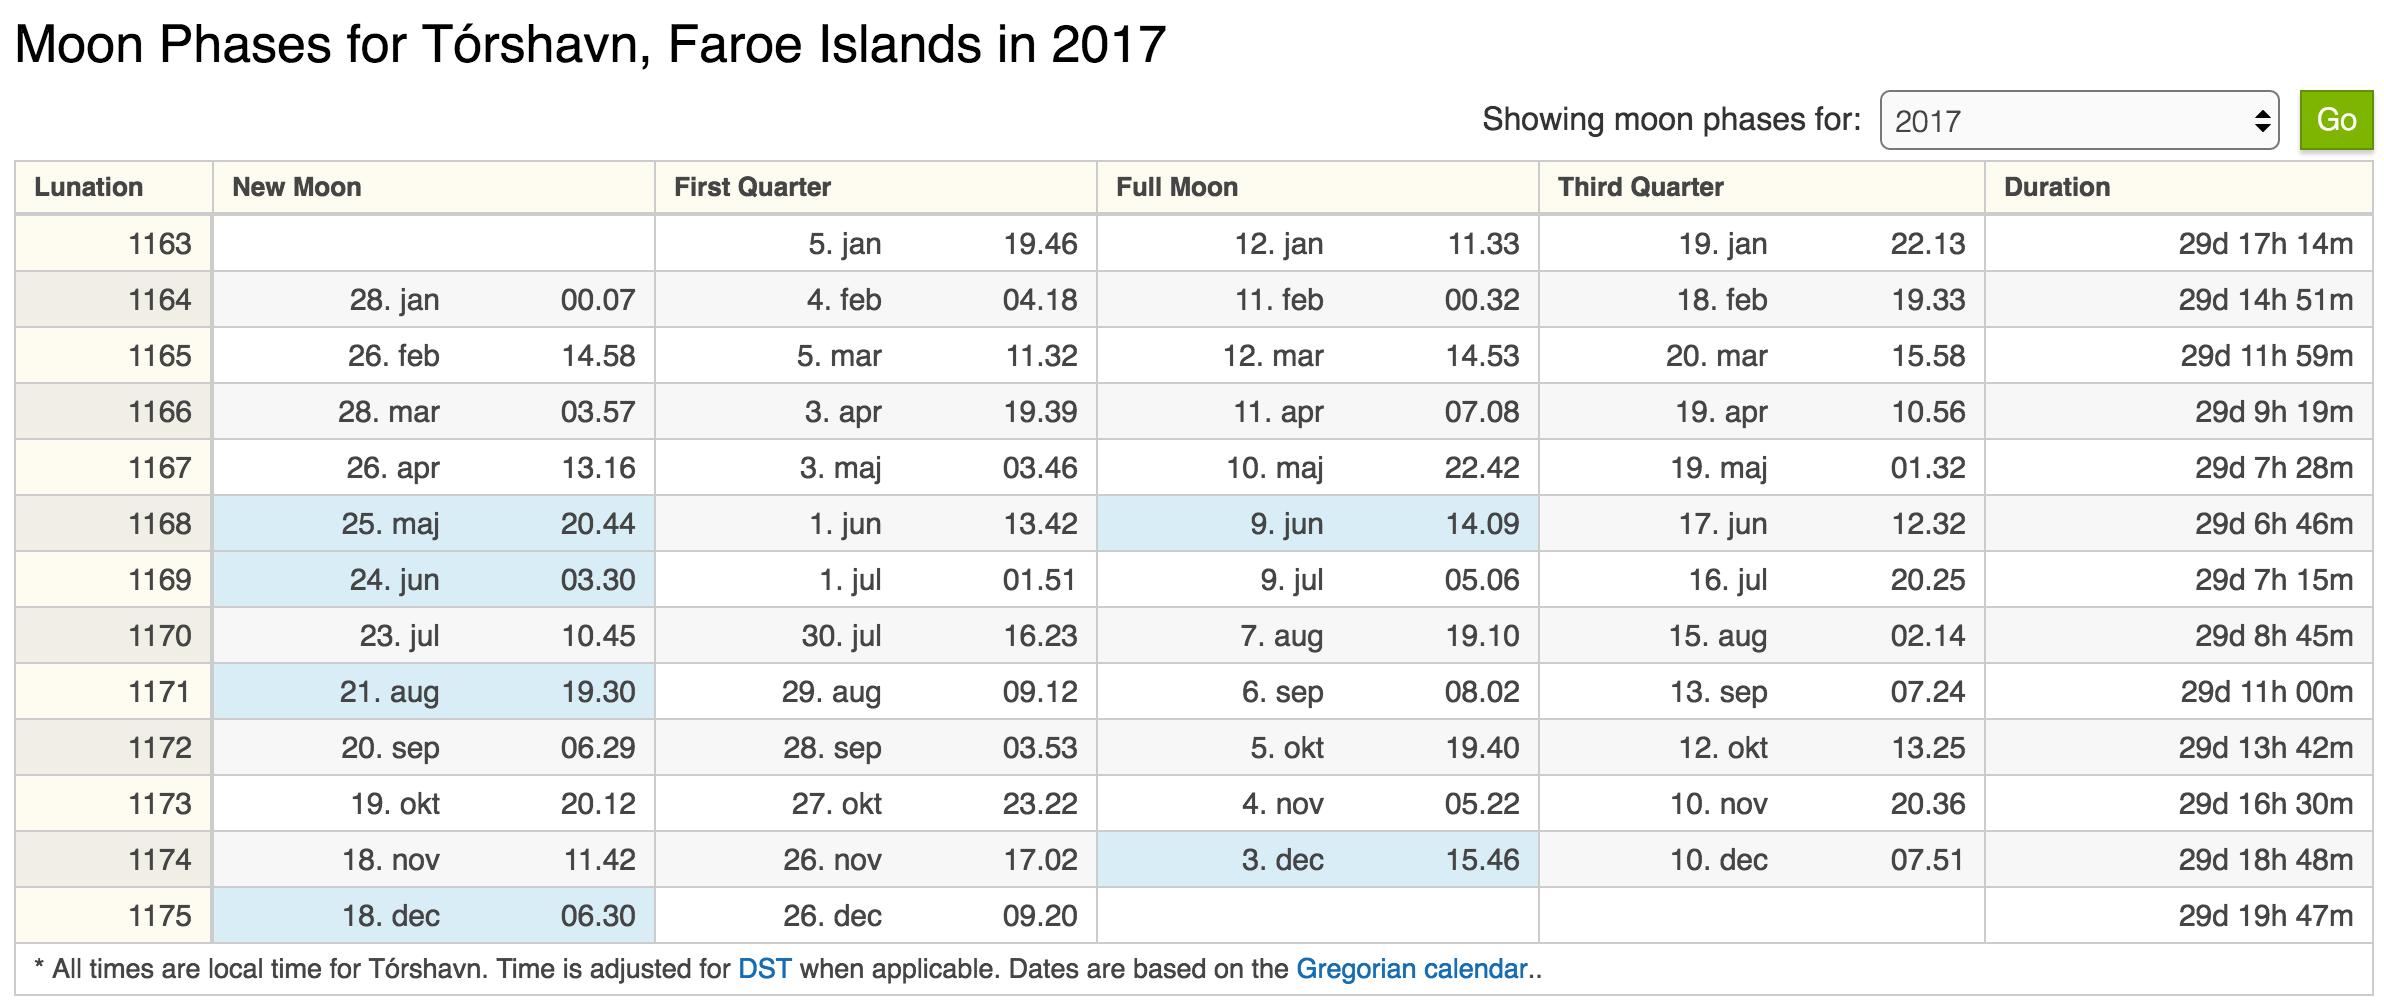 Credit: http://www.timeanddate.com/moon/phases/faroe/torshavn?year=2017